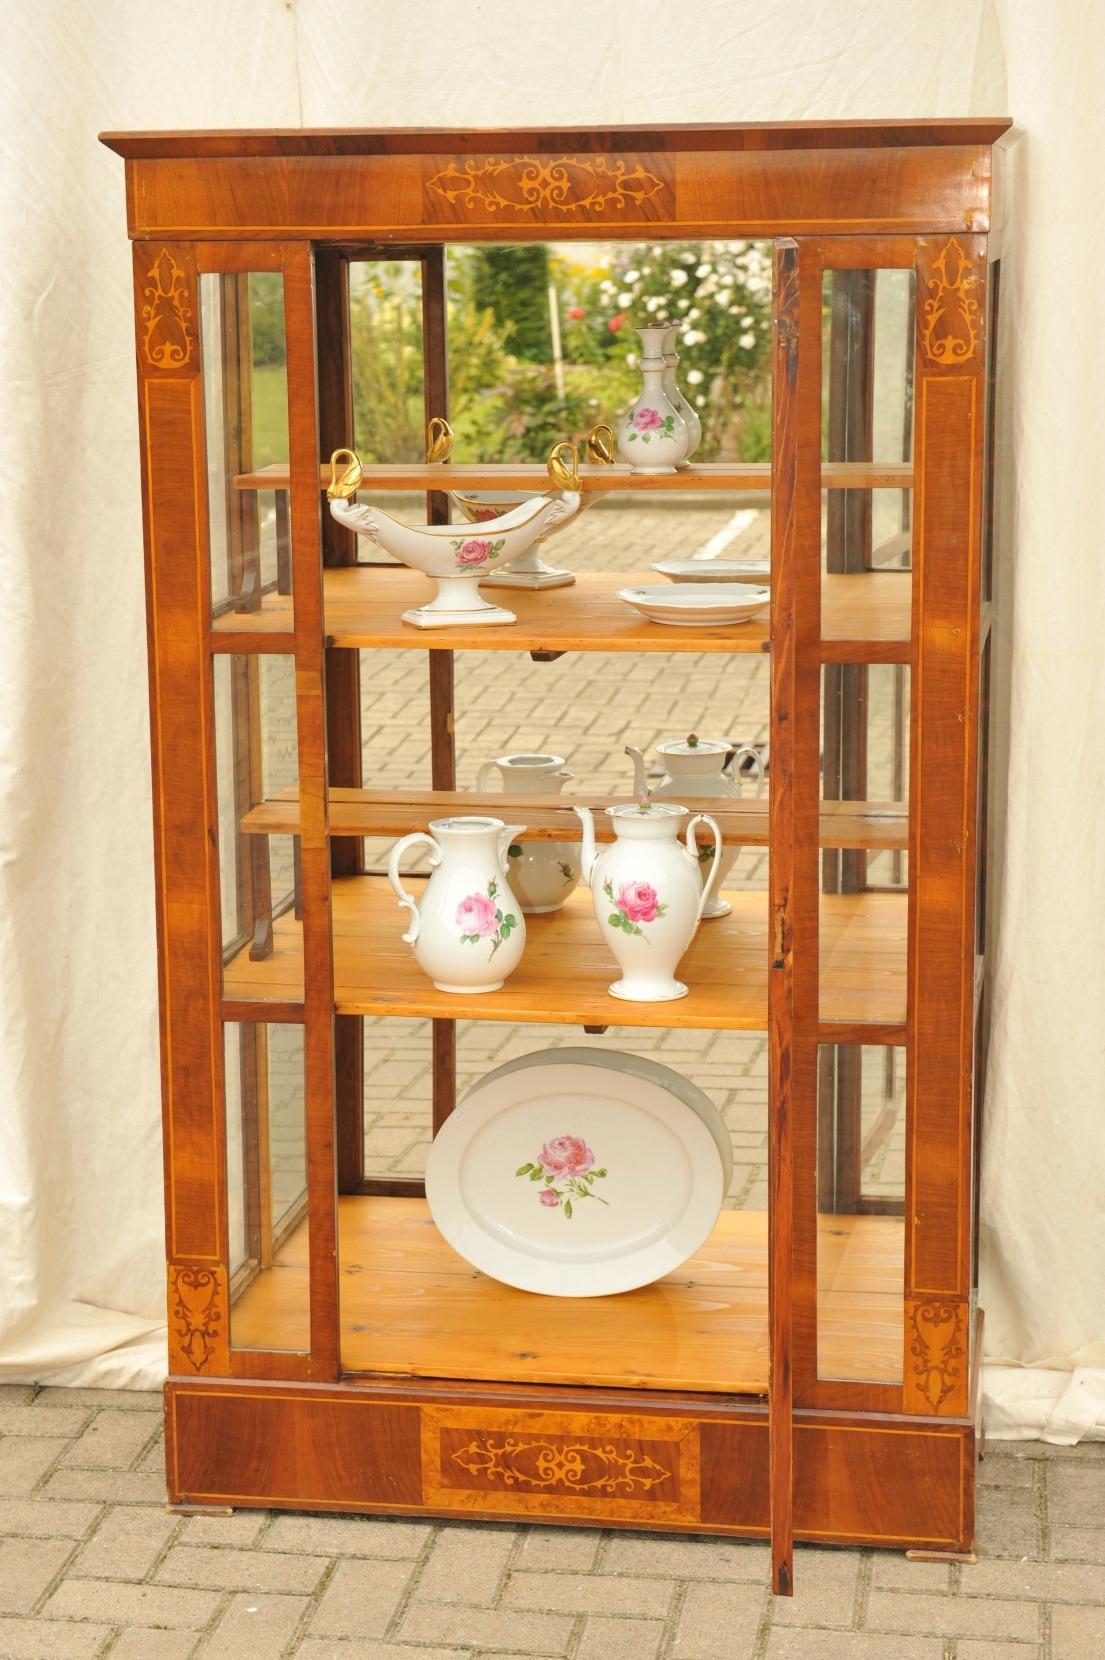 biedermeier vitrine seitenverglast wien antik im hof. Black Bedroom Furniture Sets. Home Design Ideas